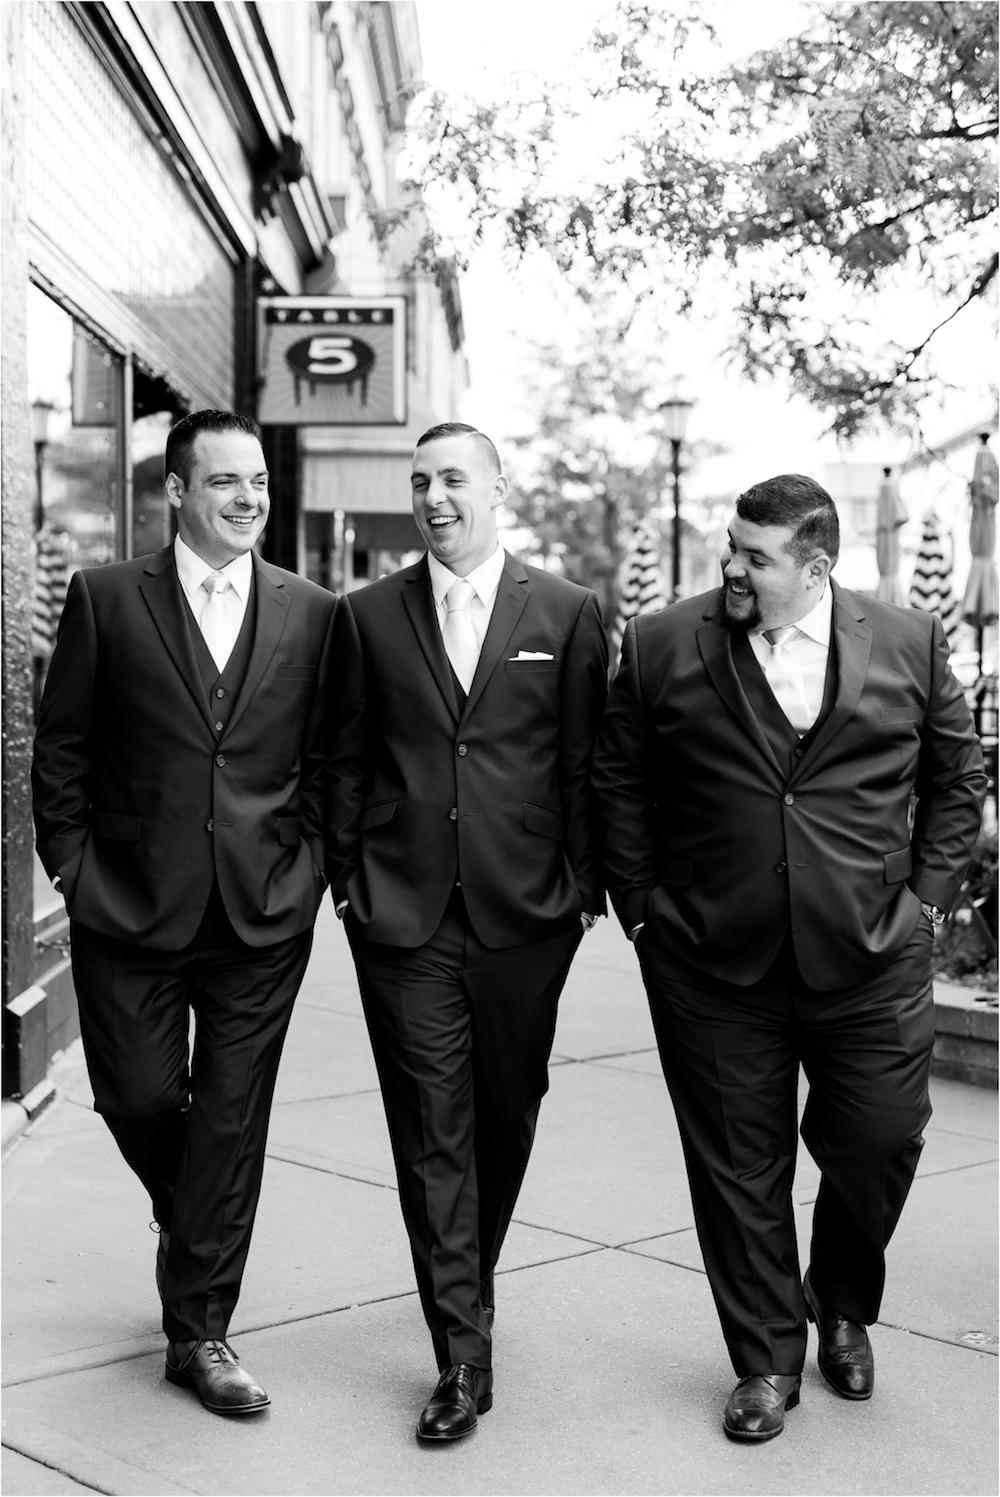 meeting-house-grand-ballroom-plymouth-michigan-wedding-photo-133.jpg